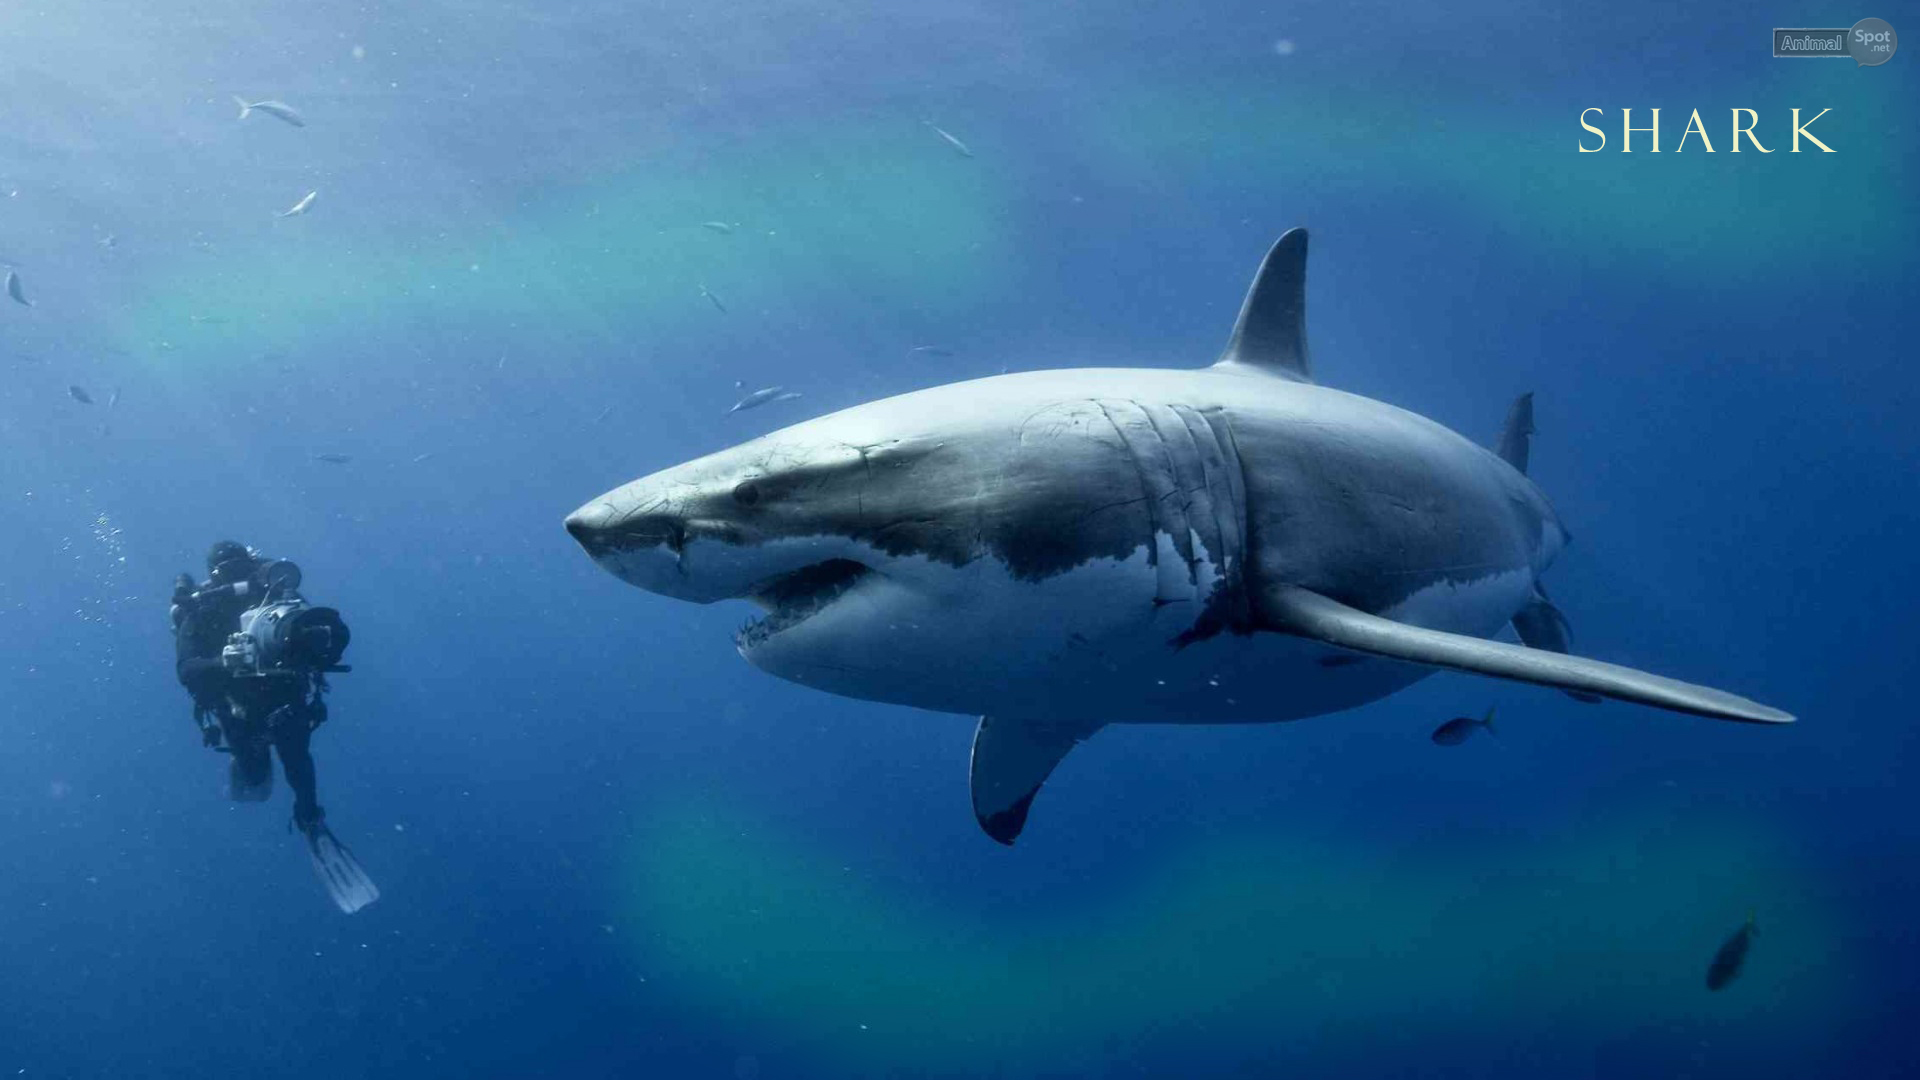 tiger shark 1280x800 - photo #13